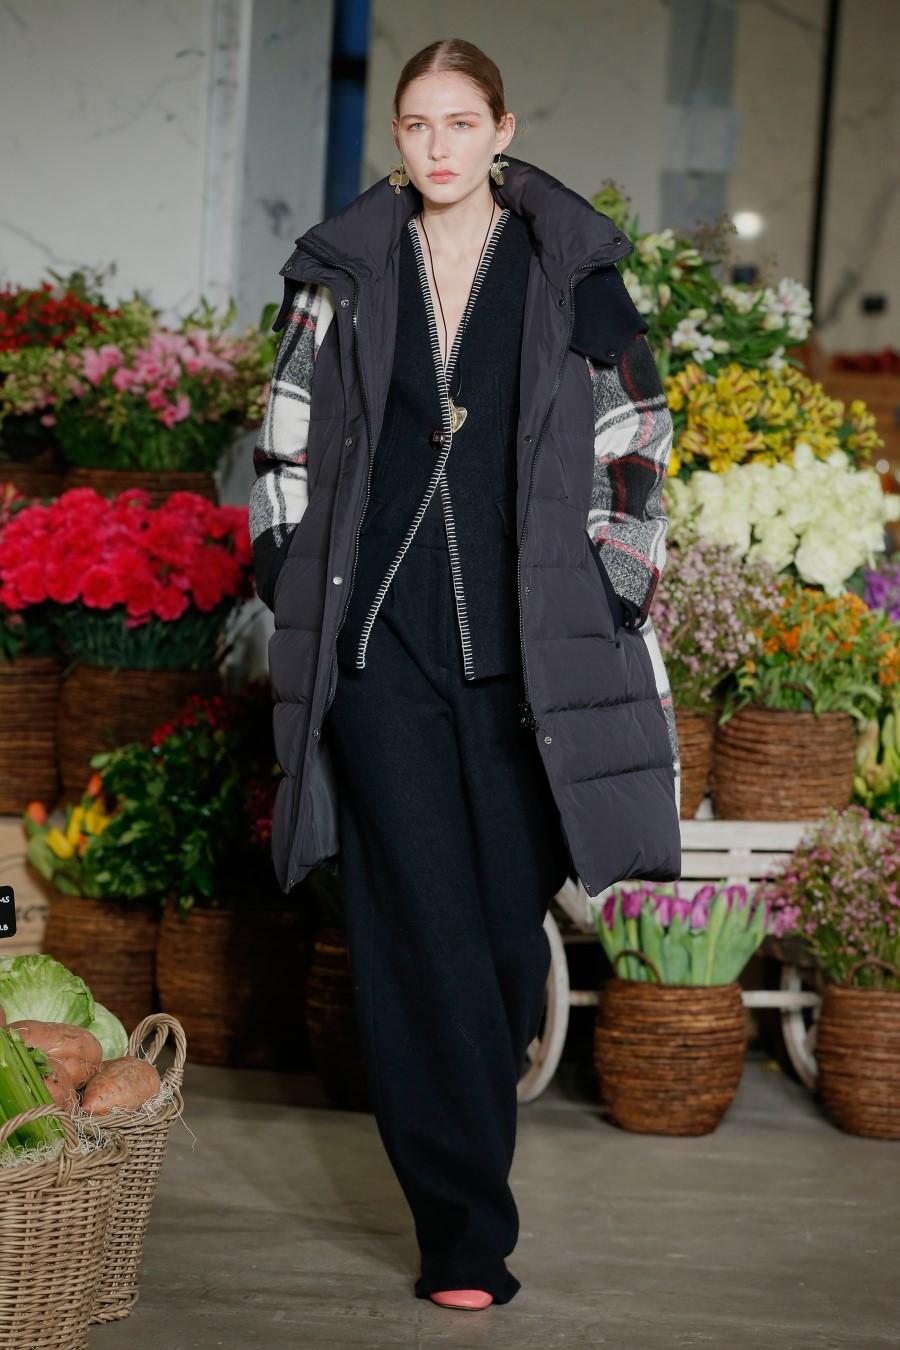 Jason Wu Fall Winter 2021 - New York Fashion Week